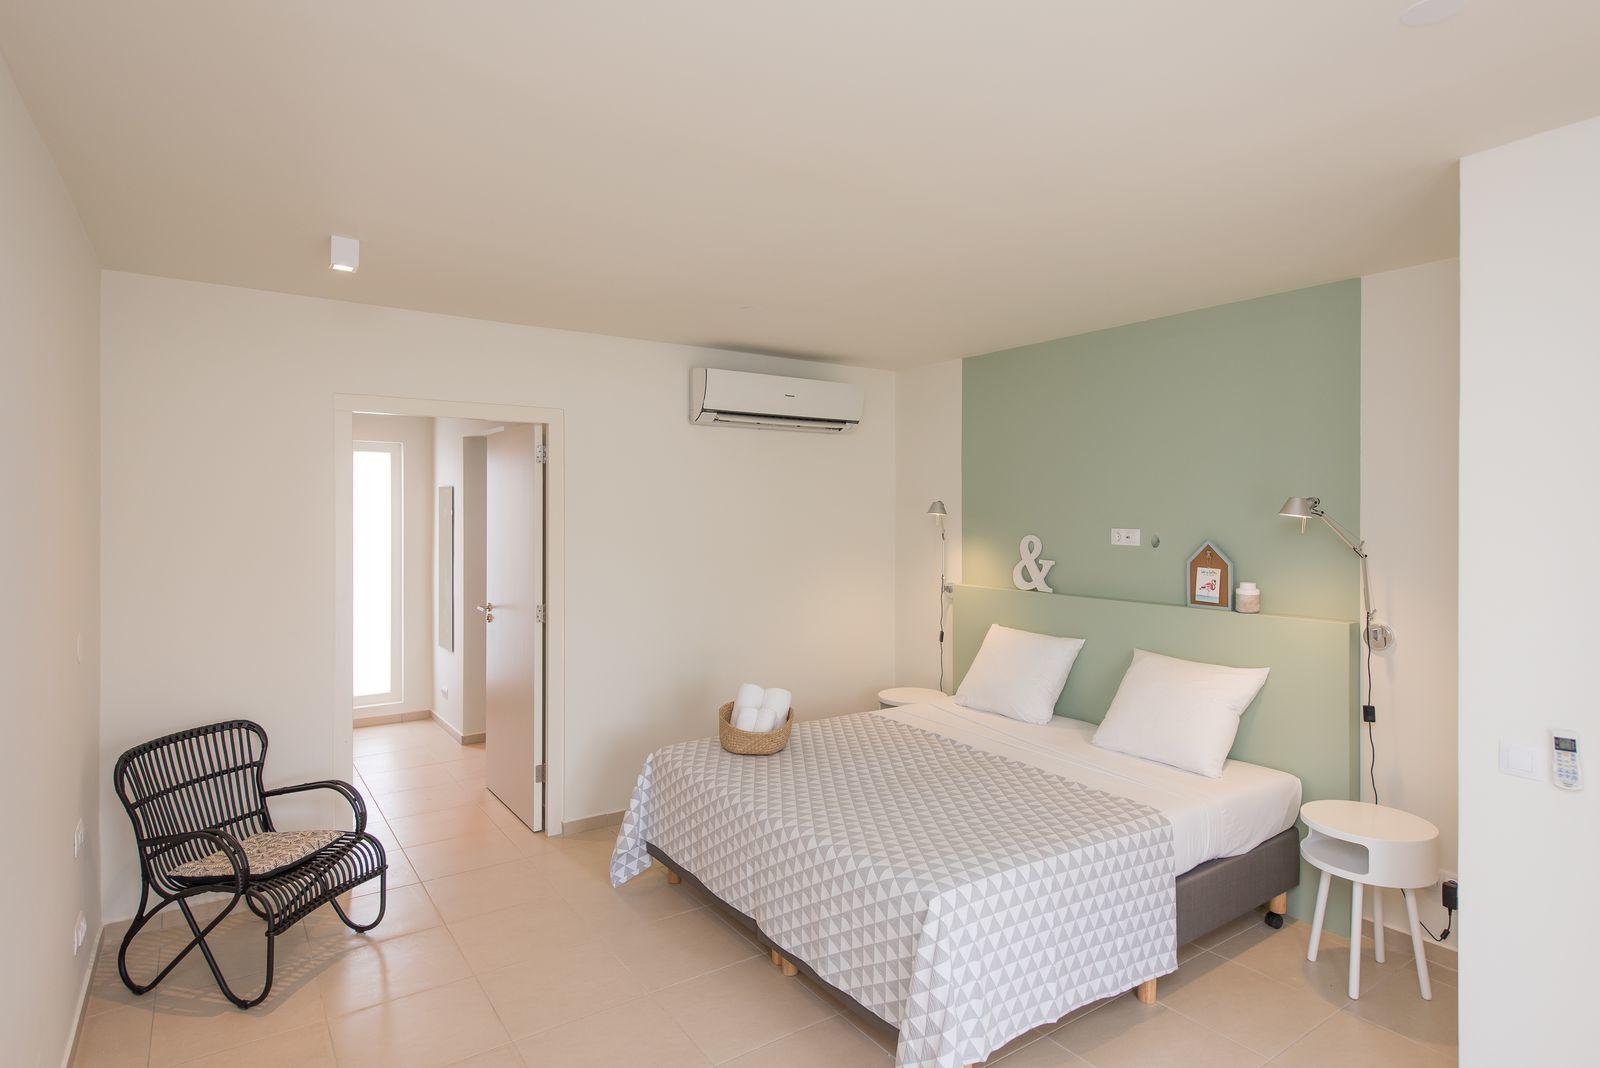 Vakantiehuis Lanais Superior | 4 Pers.